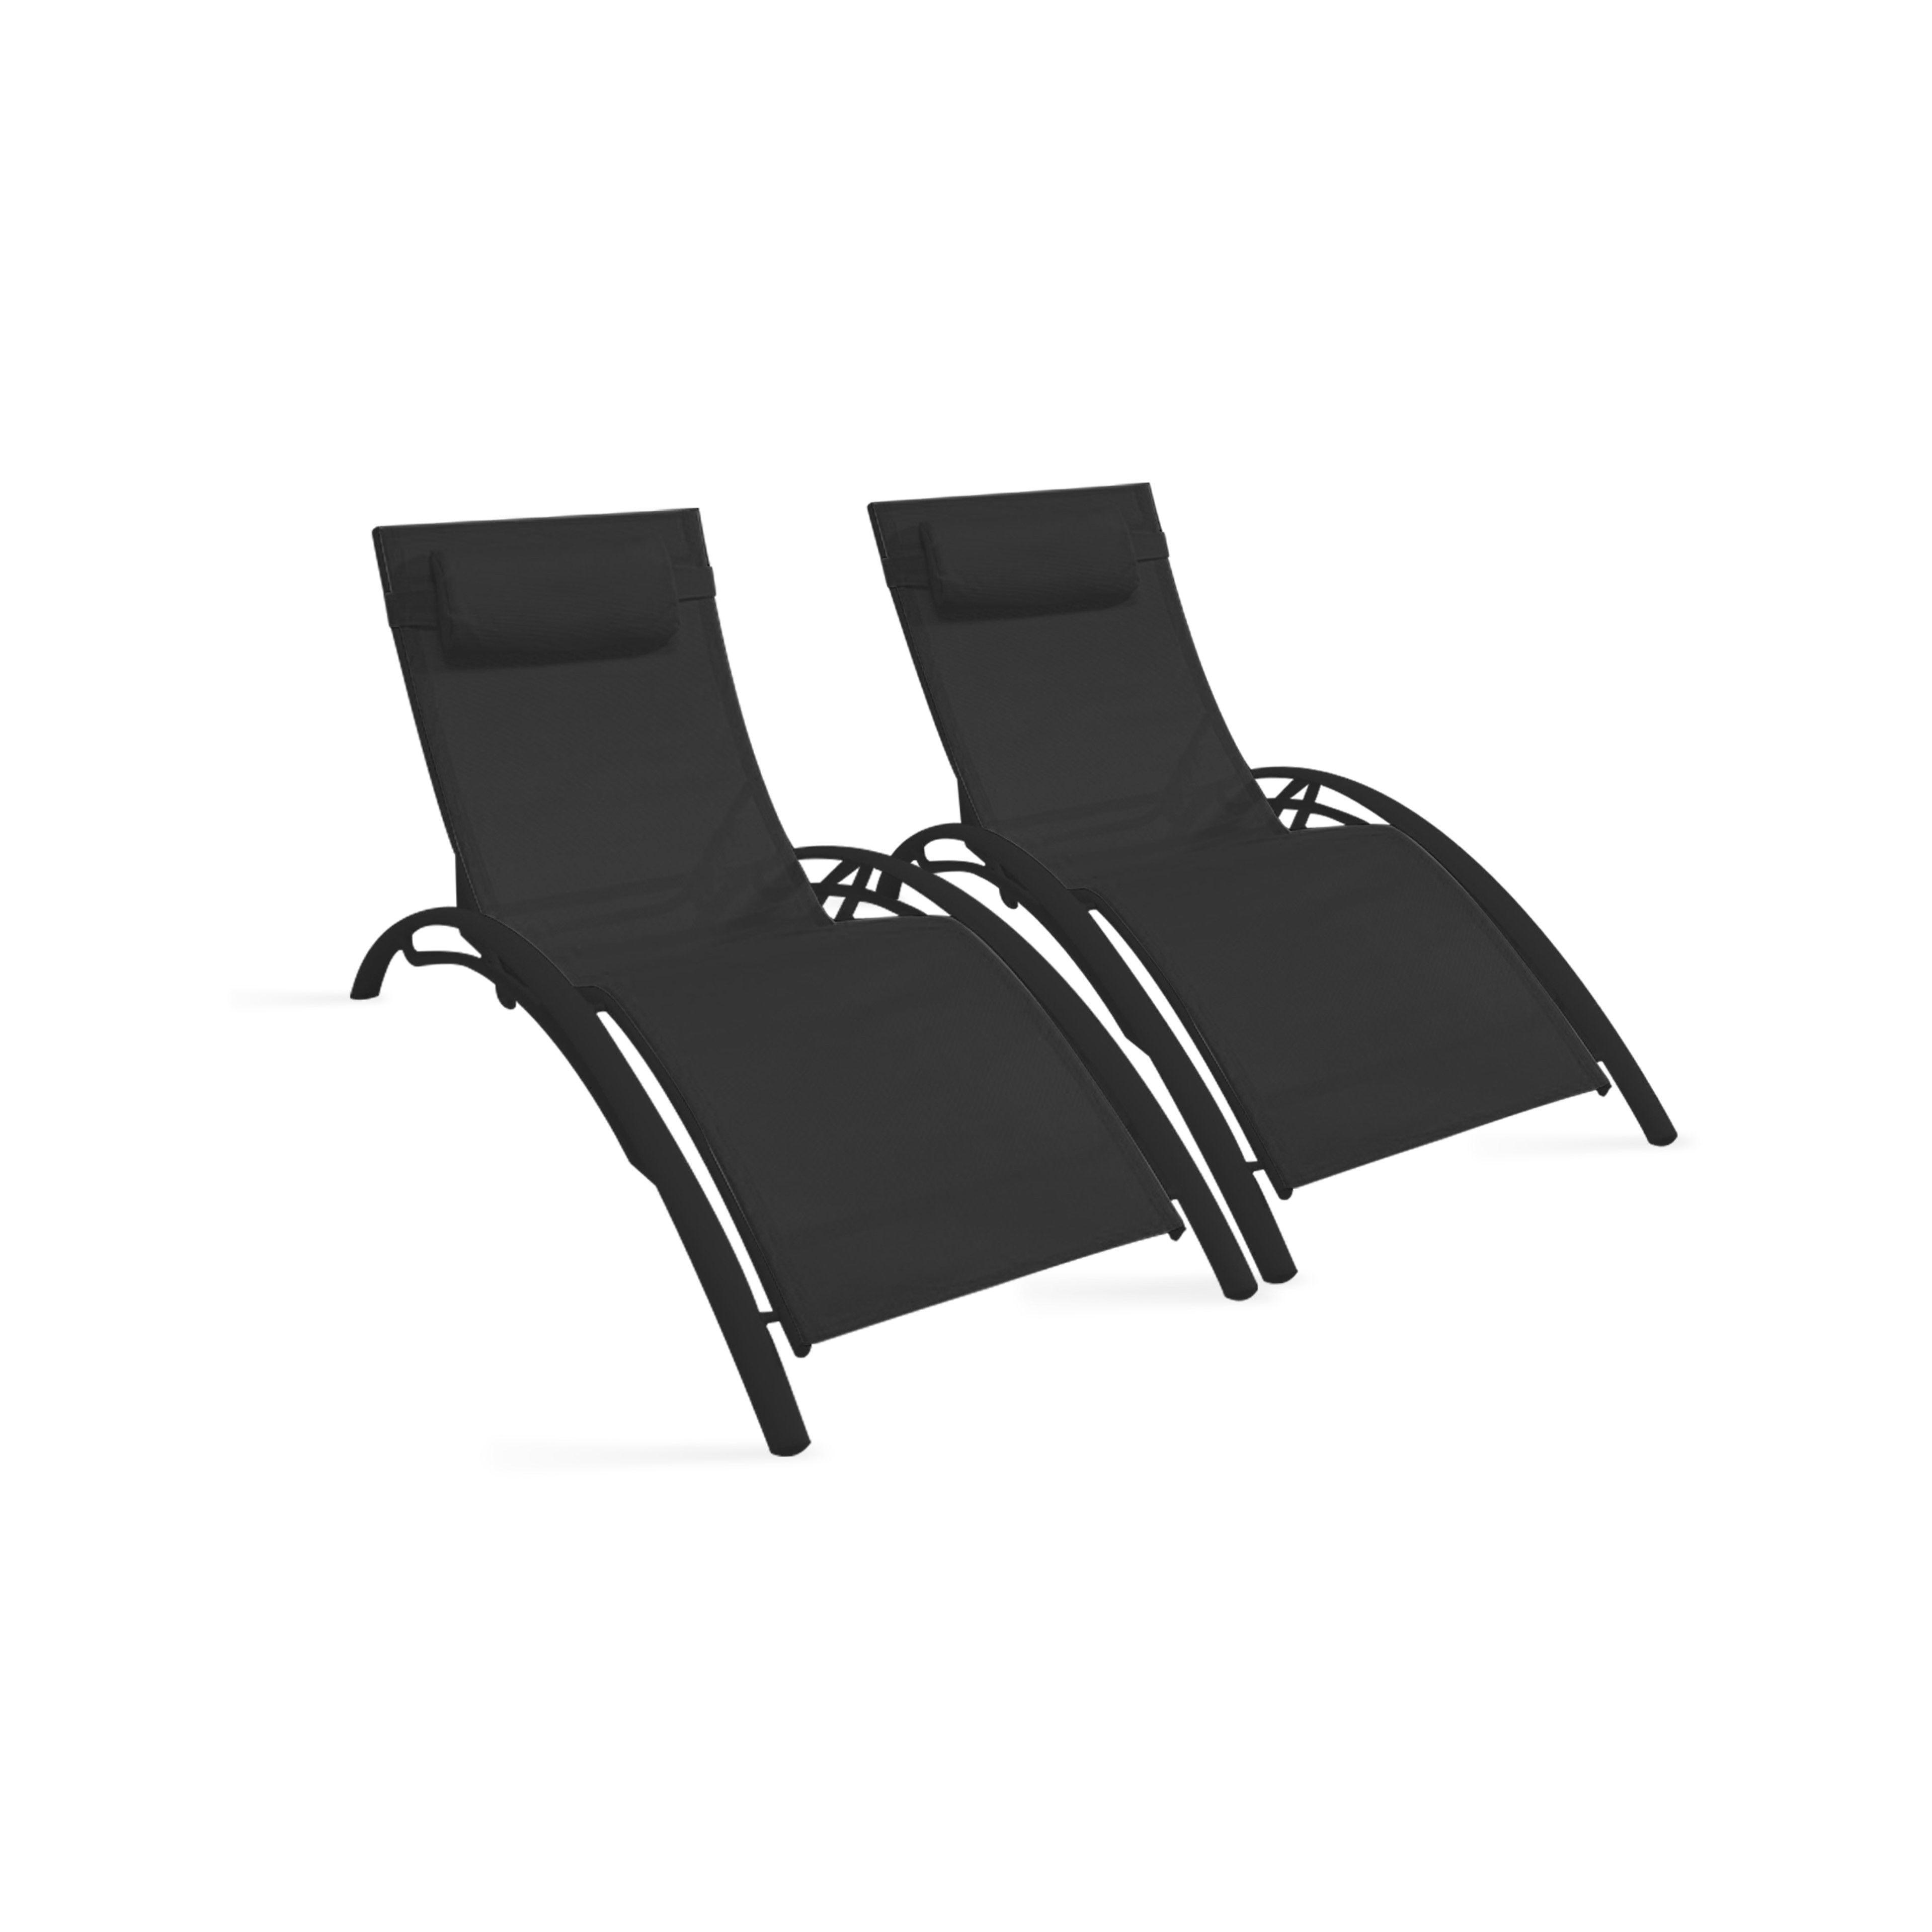 bains de soleil en aluminium et textil ne ebay. Black Bedroom Furniture Sets. Home Design Ideas